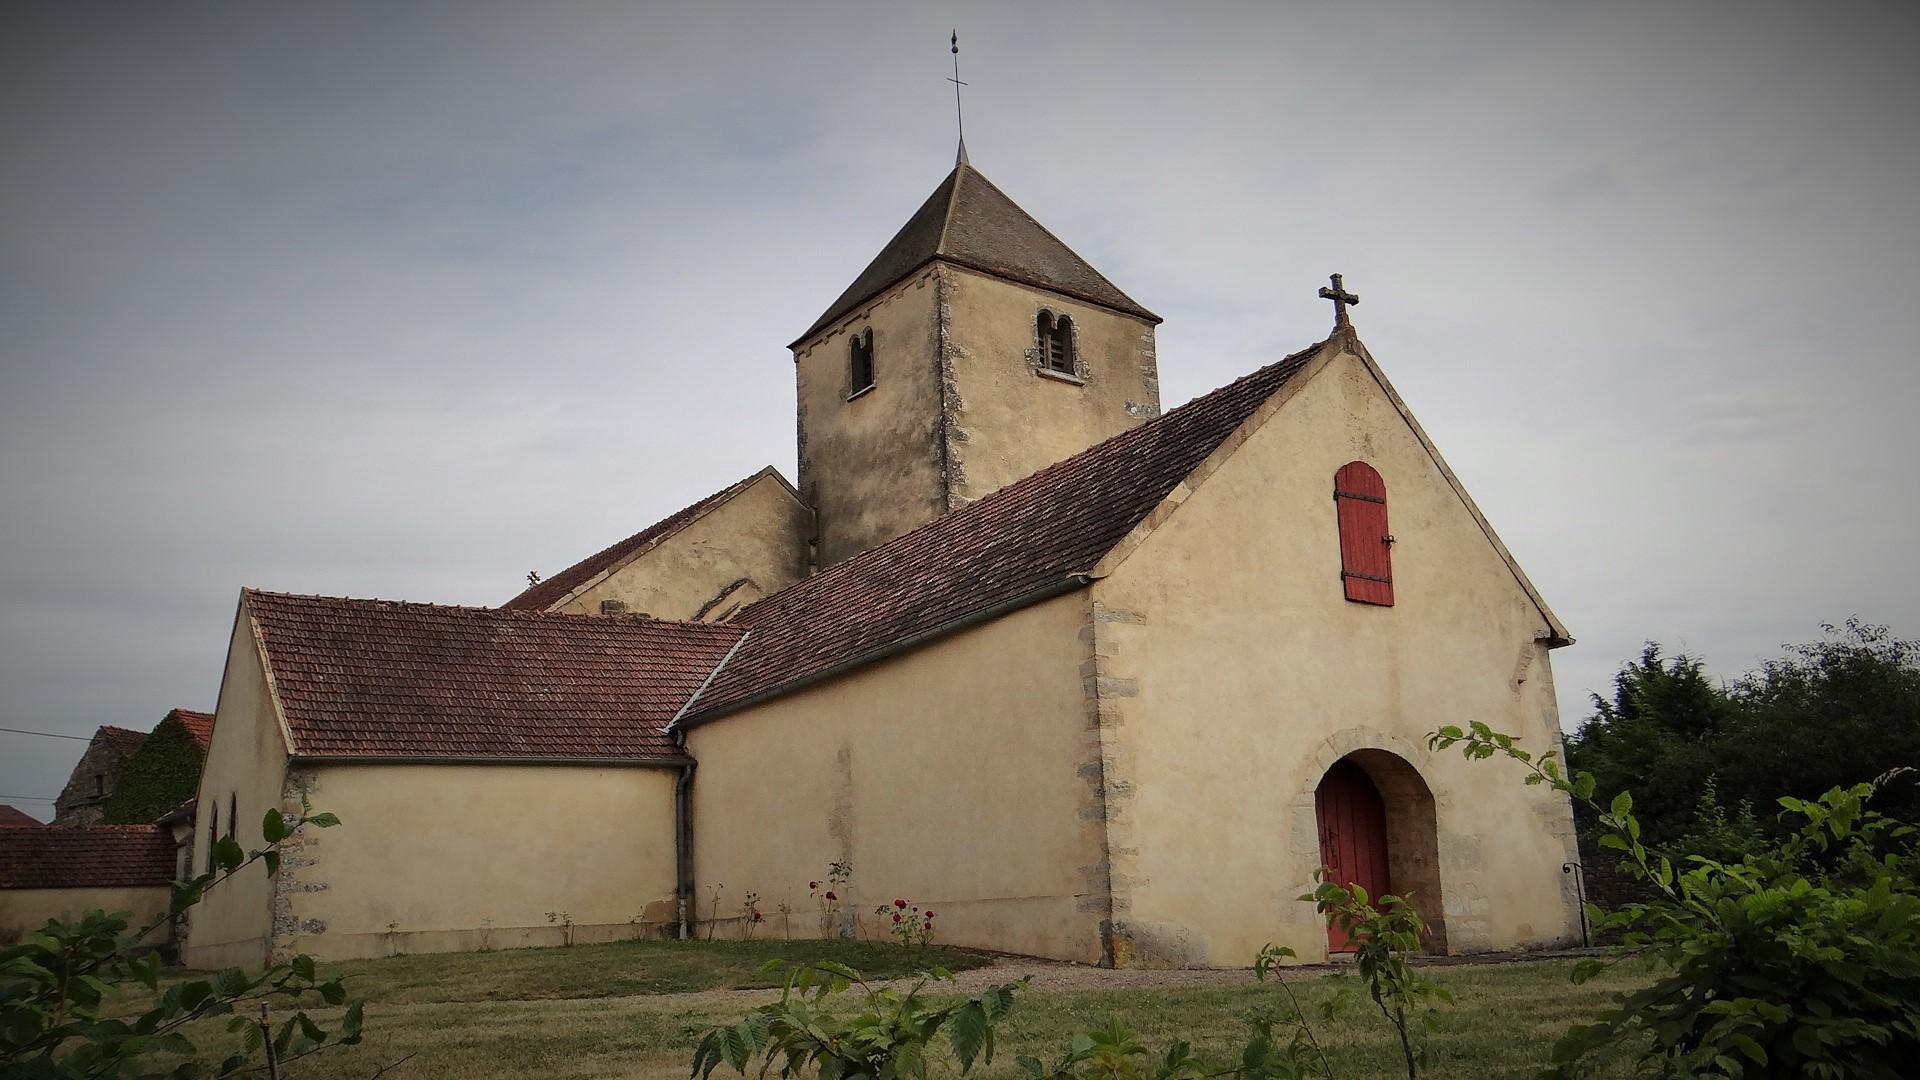 Sarry (Yonne)